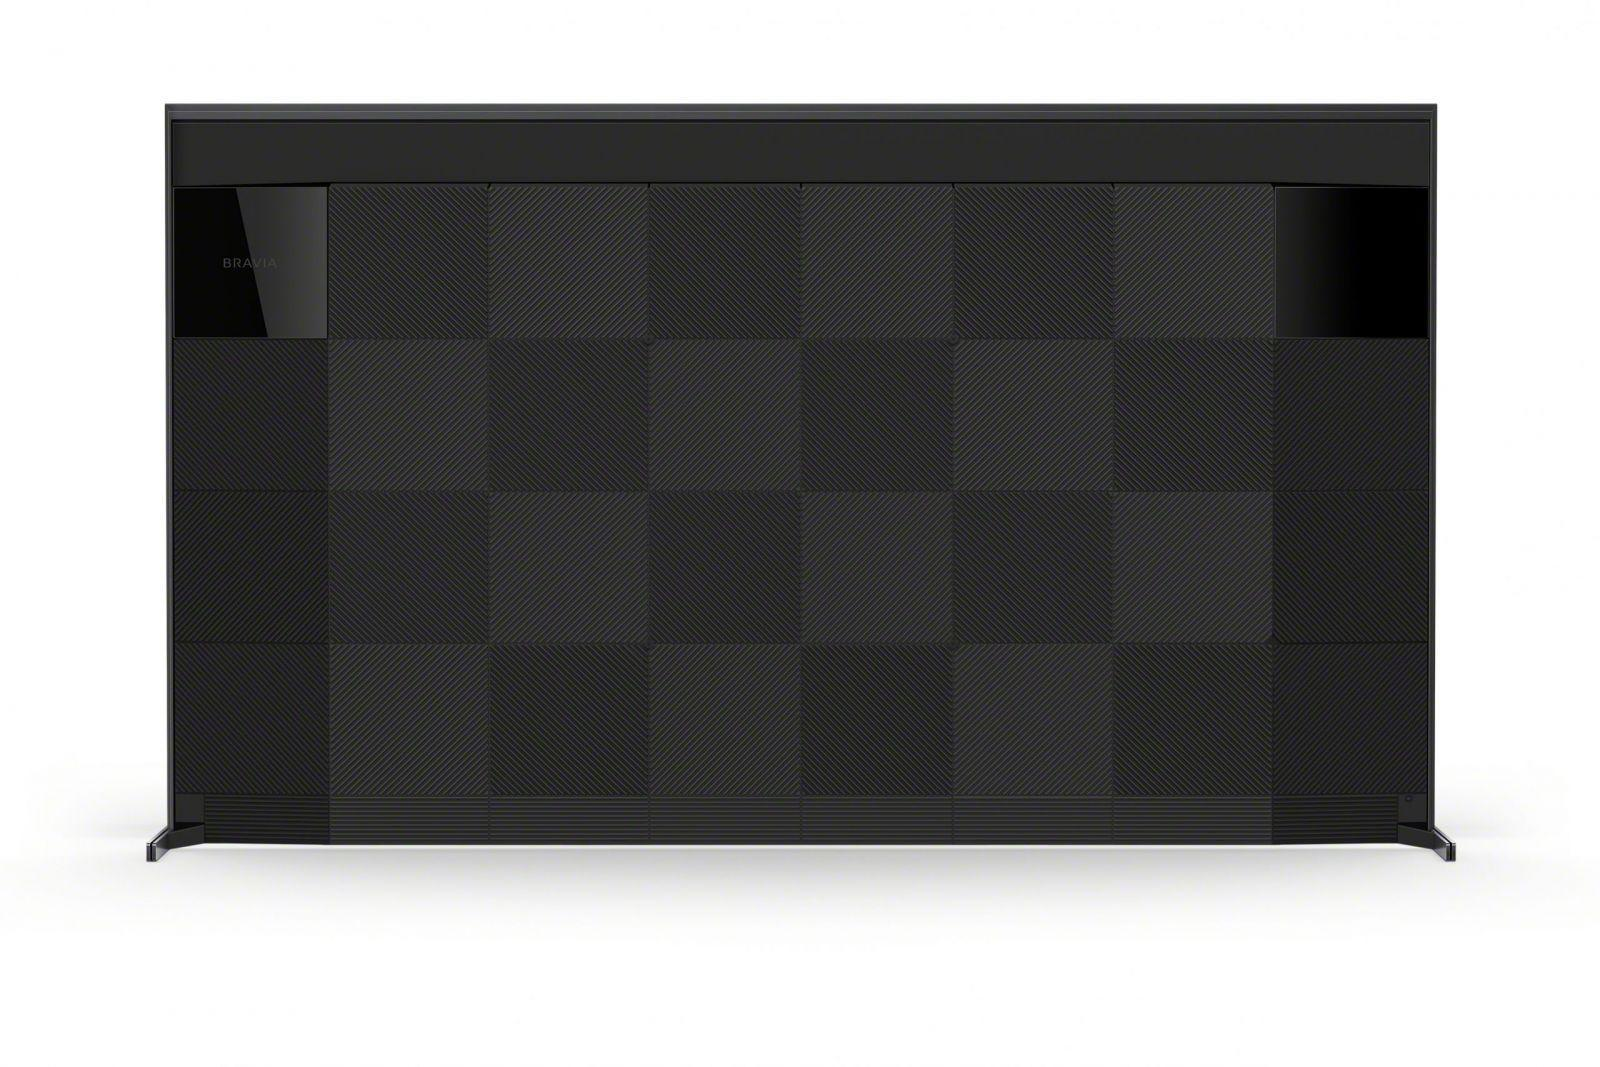 8K-телевизор Sony BRAVIA серии ZH8 с полной прямой подсветкой уже в продаже (75 z8h zh8 dark sil polished dark sil edge btyc scaled)